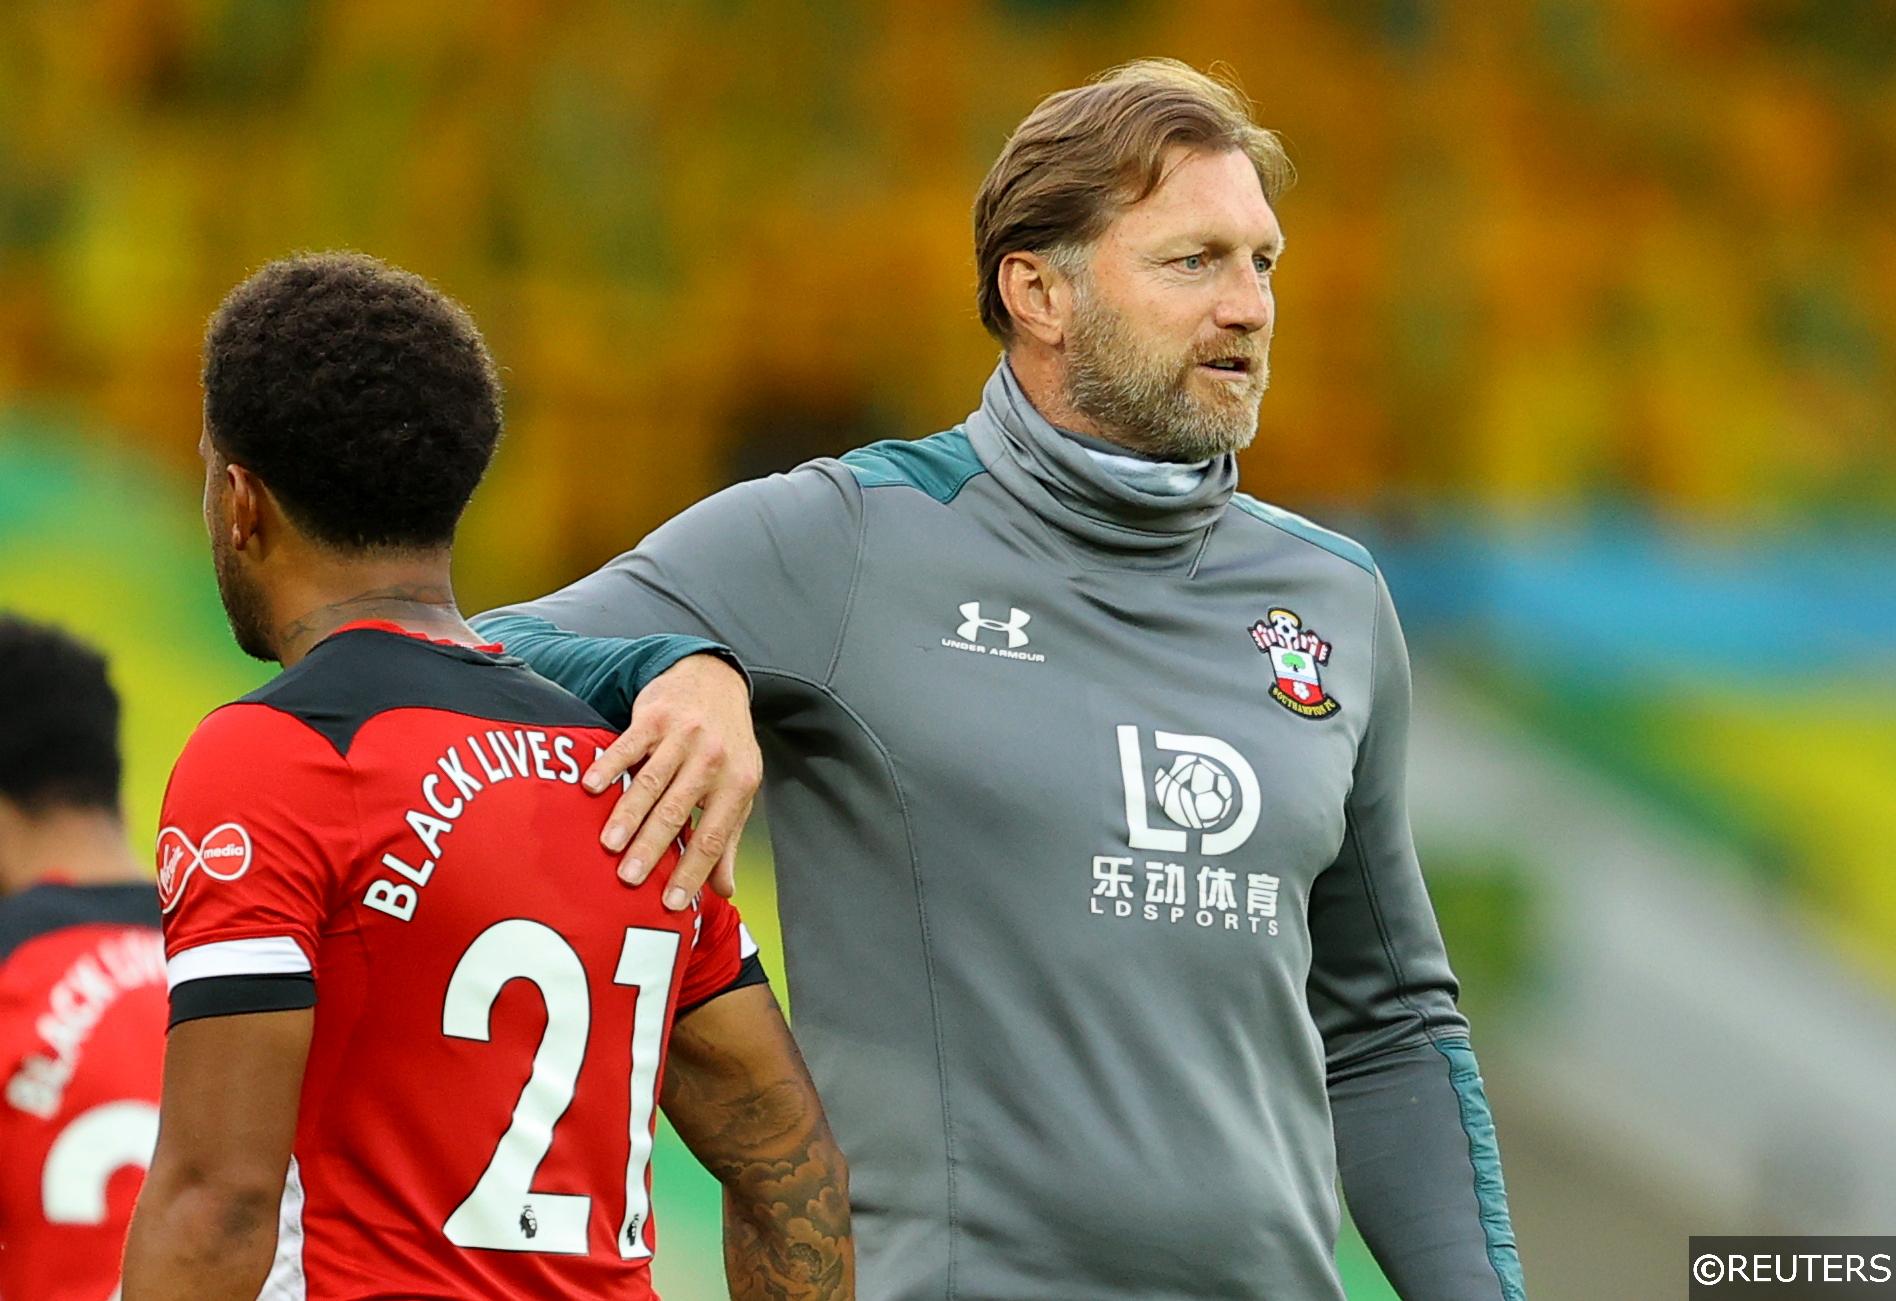 Southampton manager Ralph Hasenhuttl and defender Ryan Bertrand